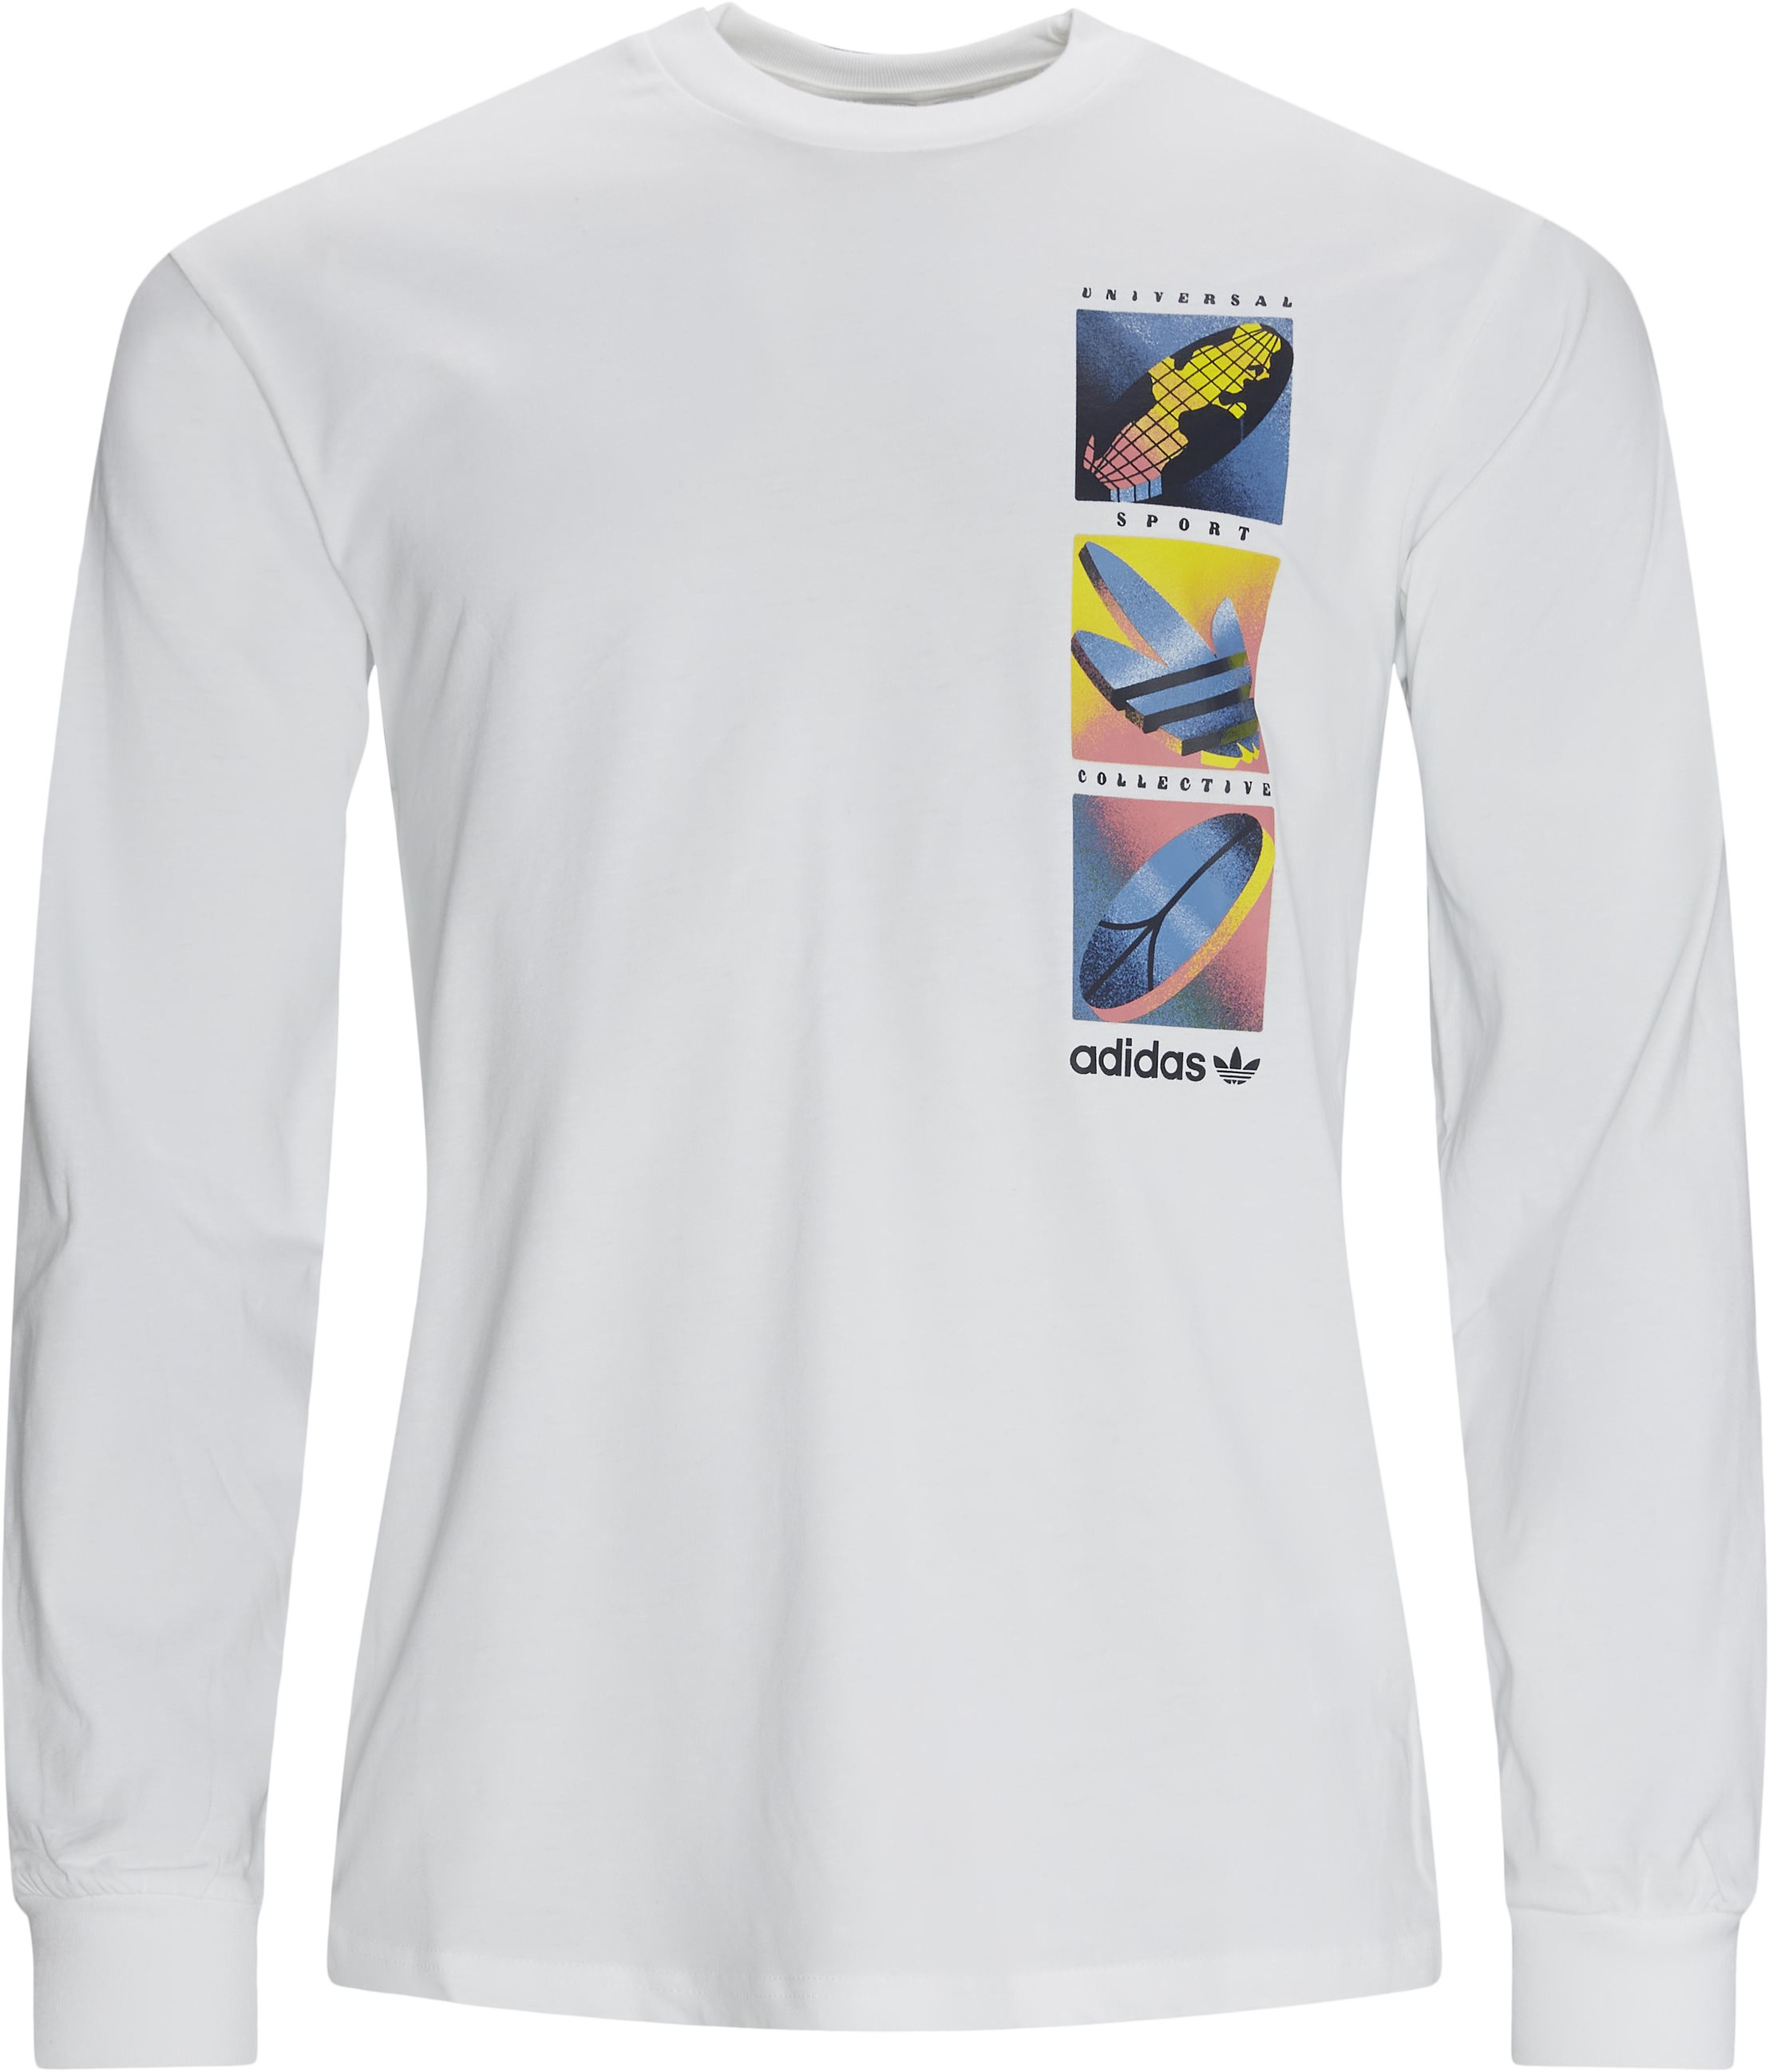 LS Summer Icons Tee  - T-shirts - Regular fit - Hvid